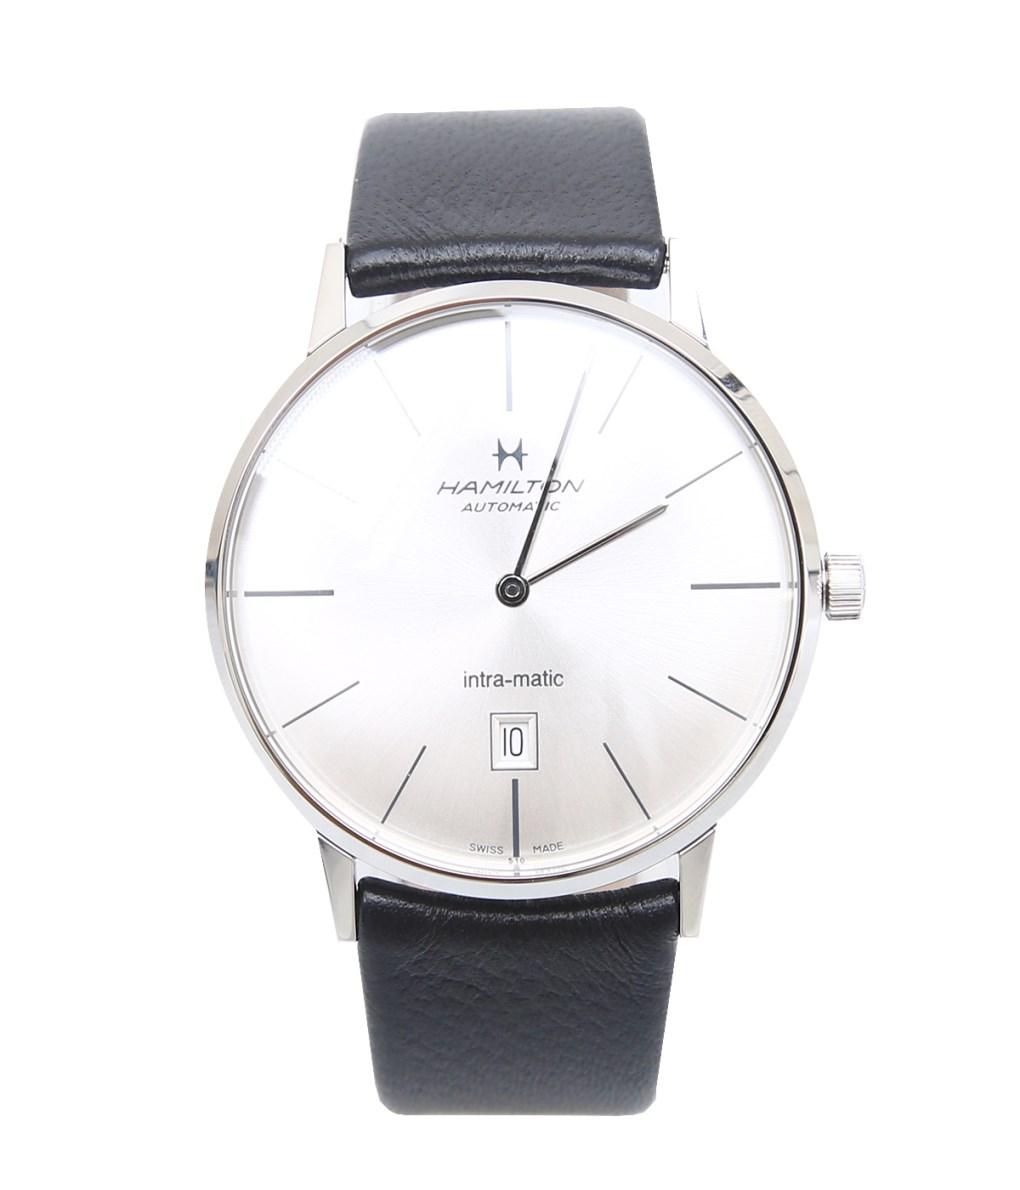 HAMILTON / ハミルトン : イントラマティック : イントラマティック オート 腕時計 ハミルトン 新作 : H38755751 【MUS】